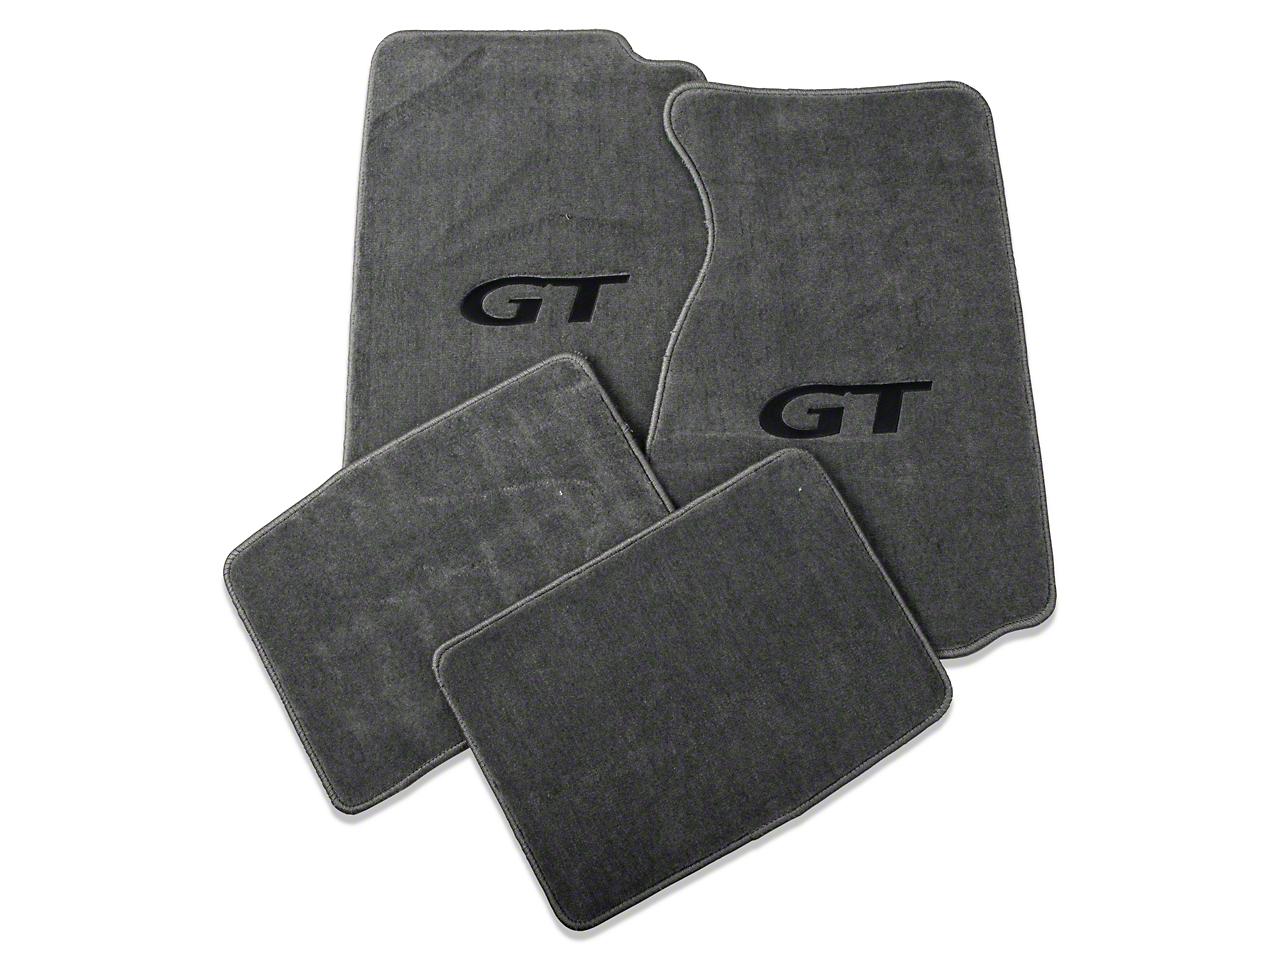 Lloyd Gray Floor Mats - Coupe - GT Logo (94-98 All)